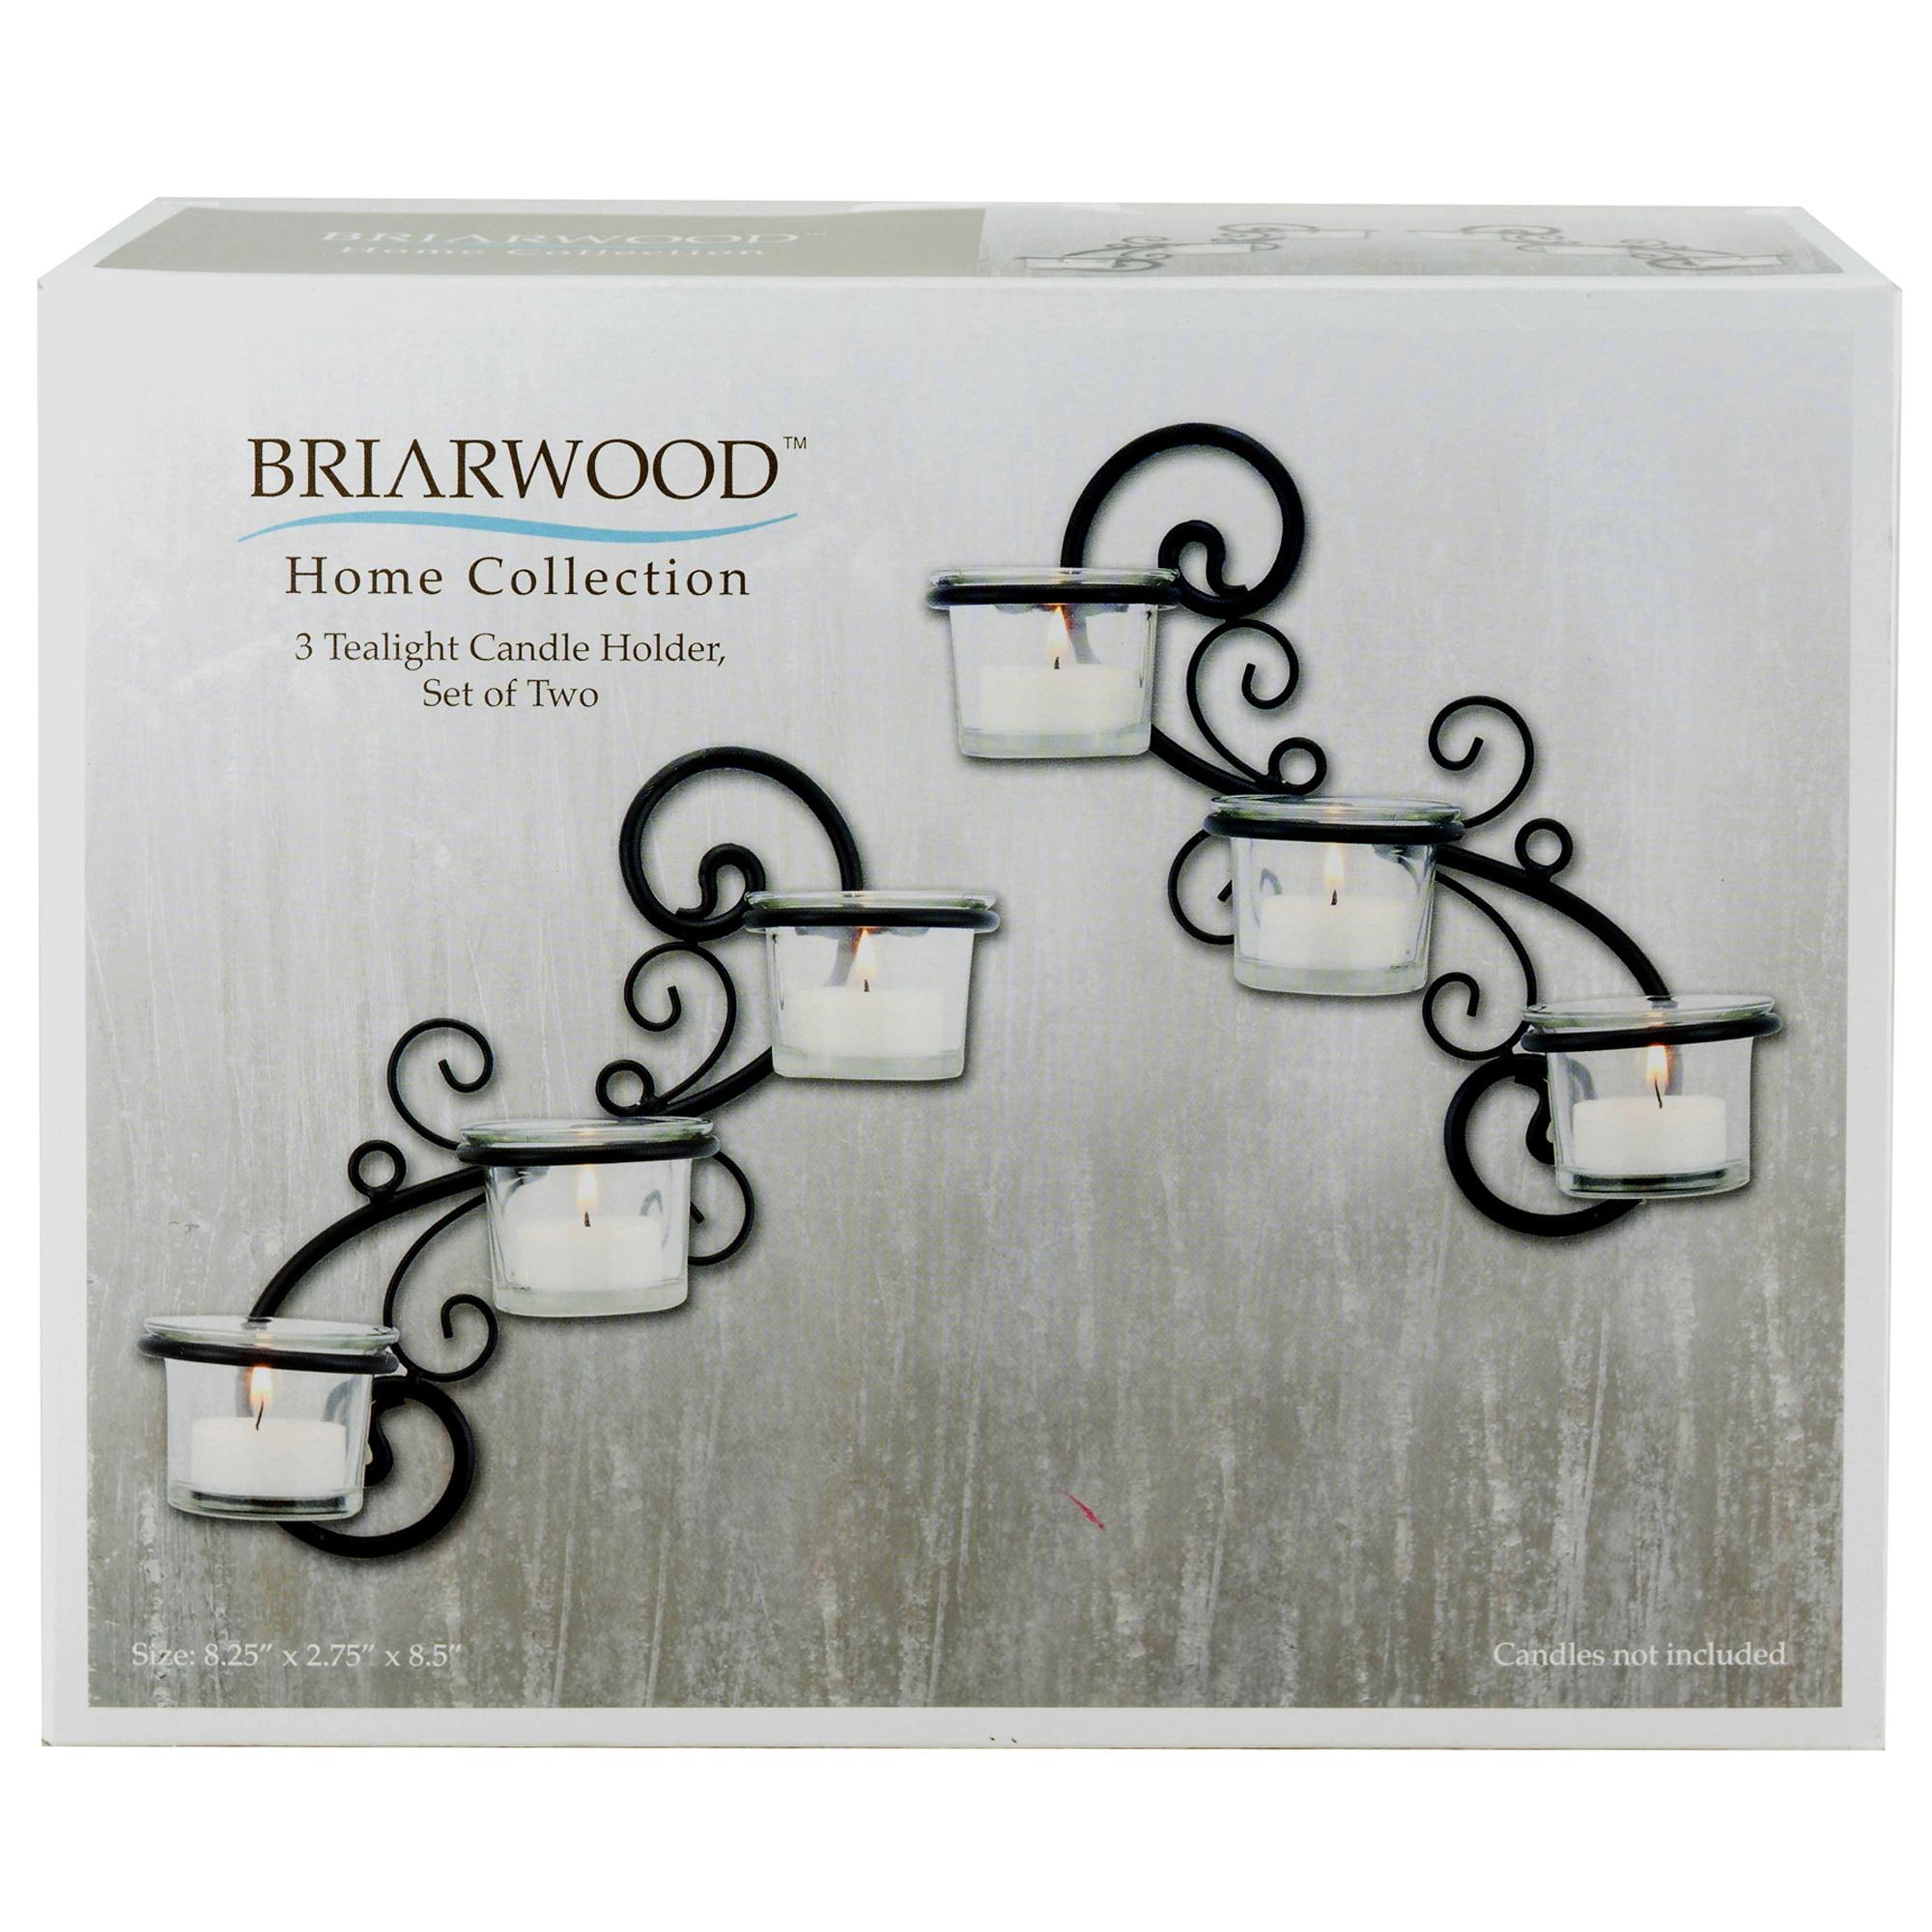 Stonebriar Collection Stonebriar Decorative Tea Light Candle Holder Wall Sconce Set,... by CKK HOME DᅢノCOR